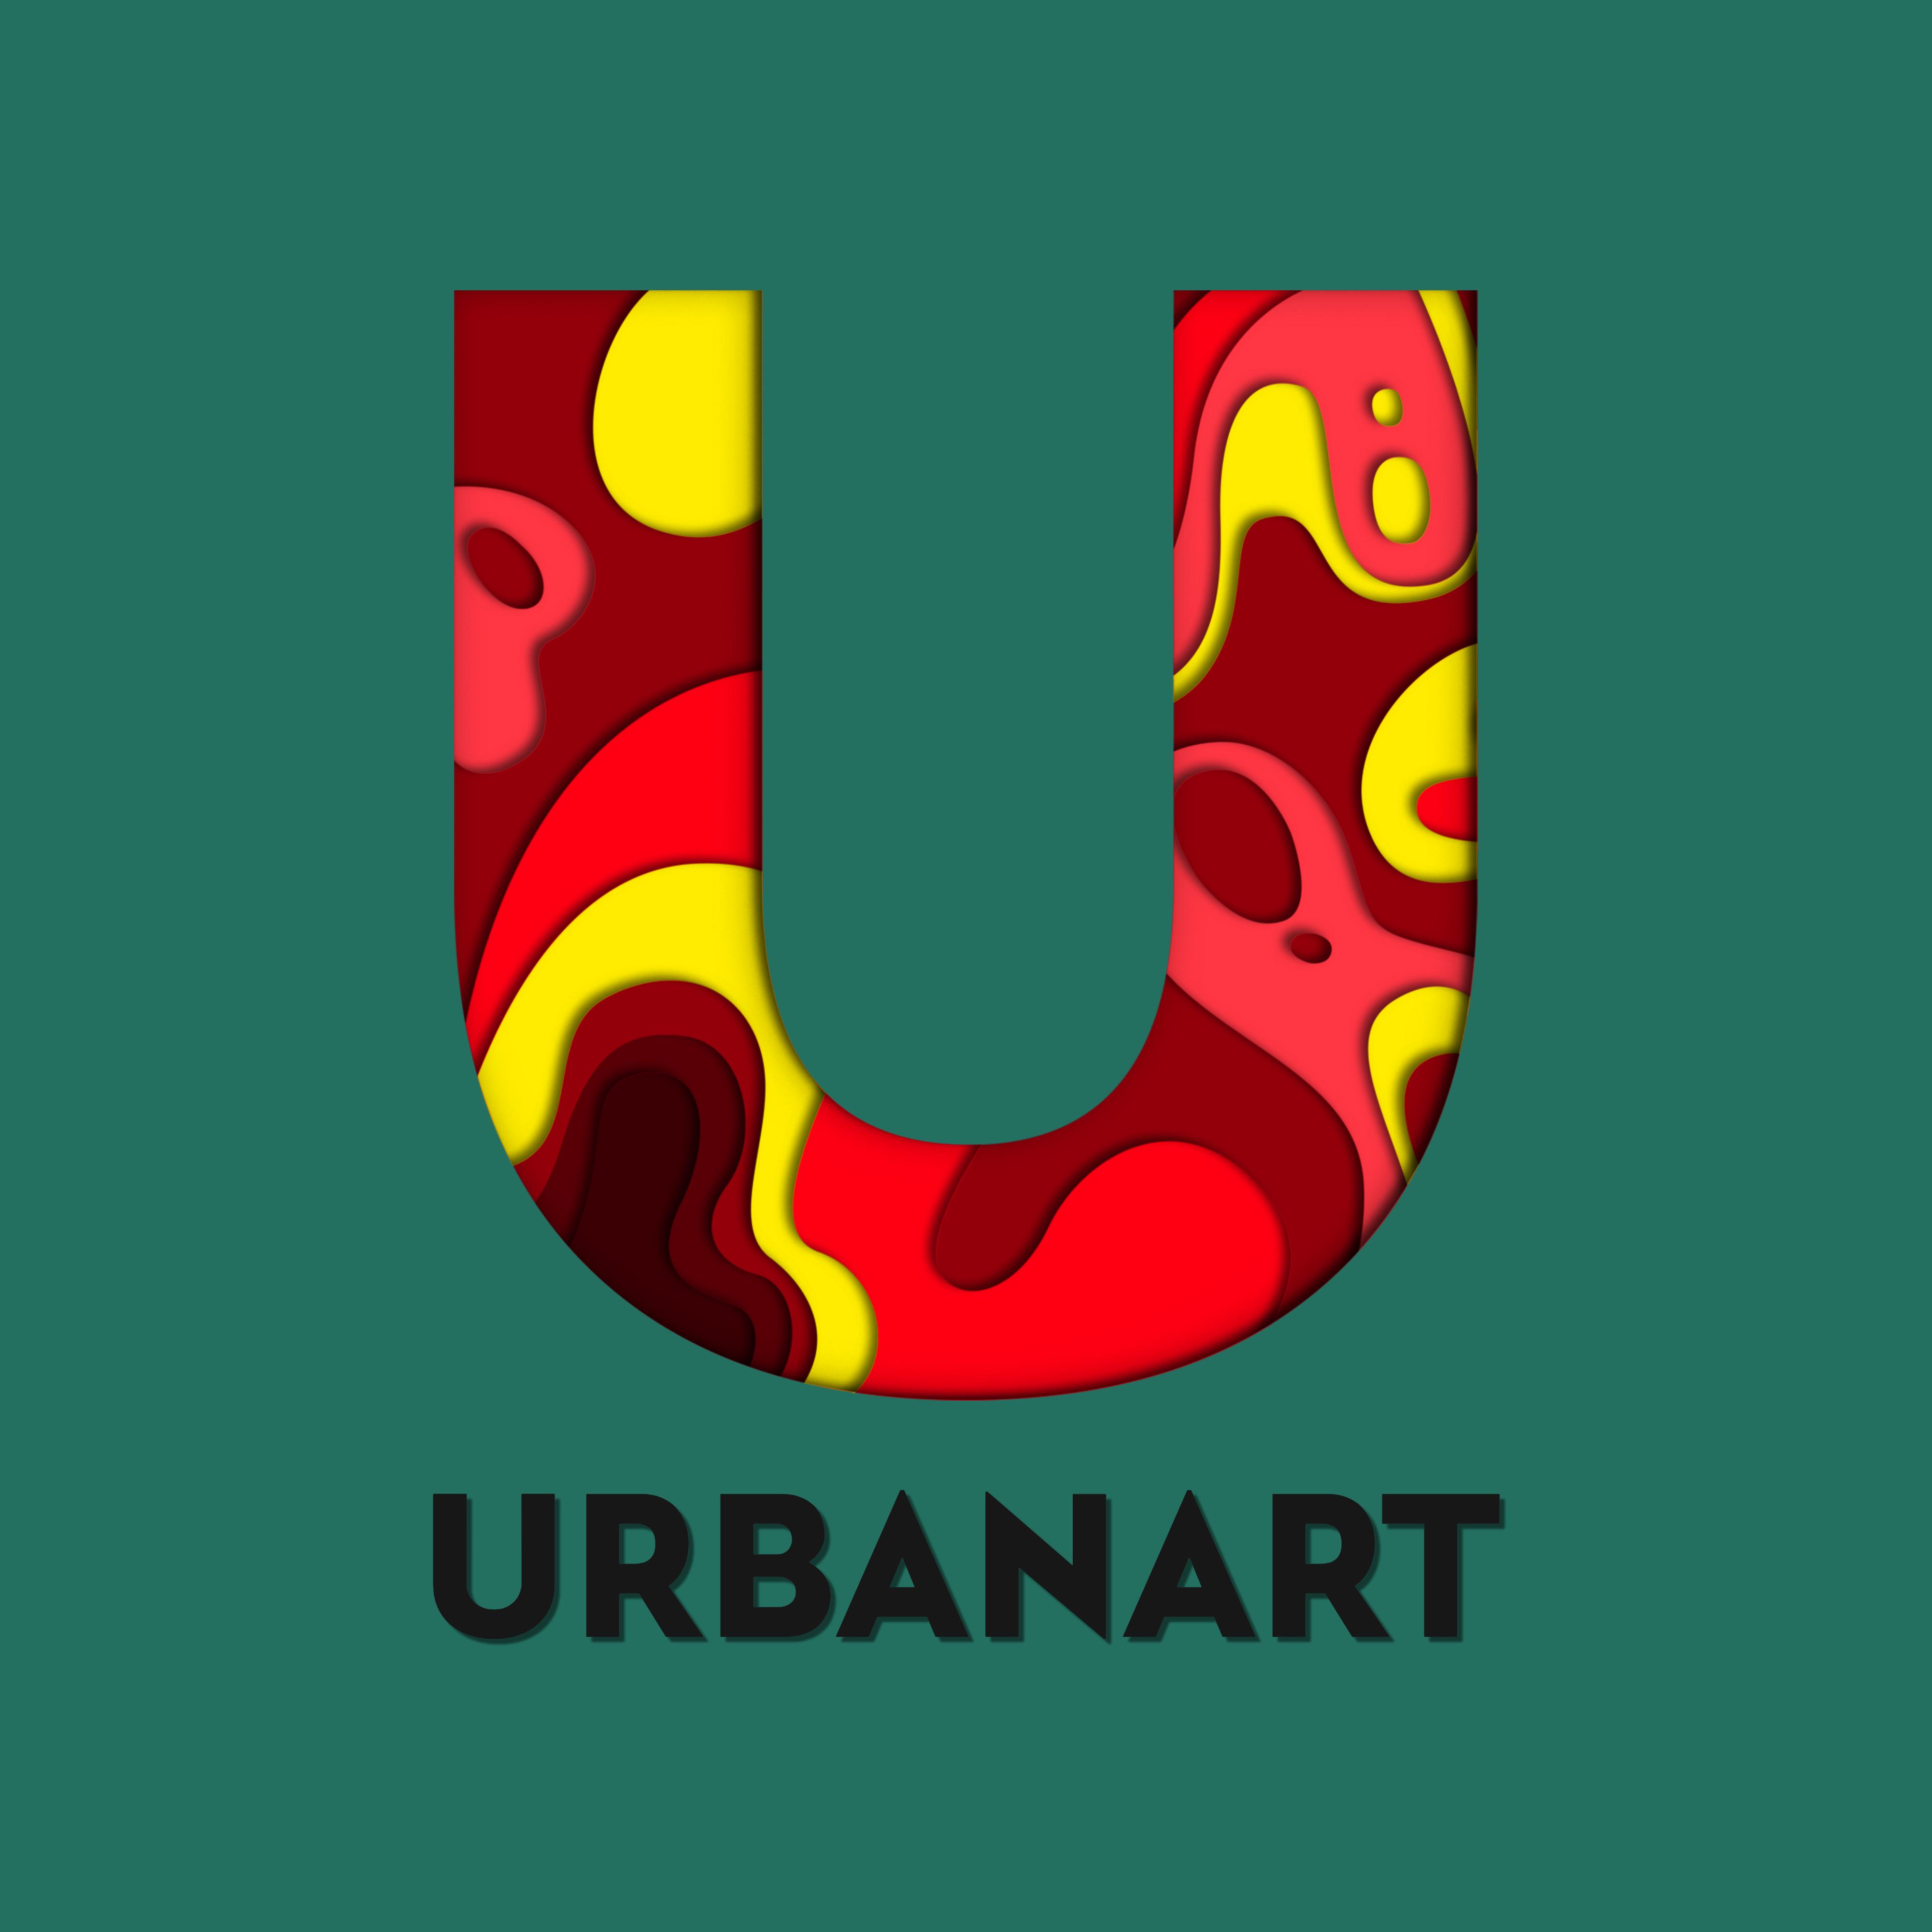 URBANART